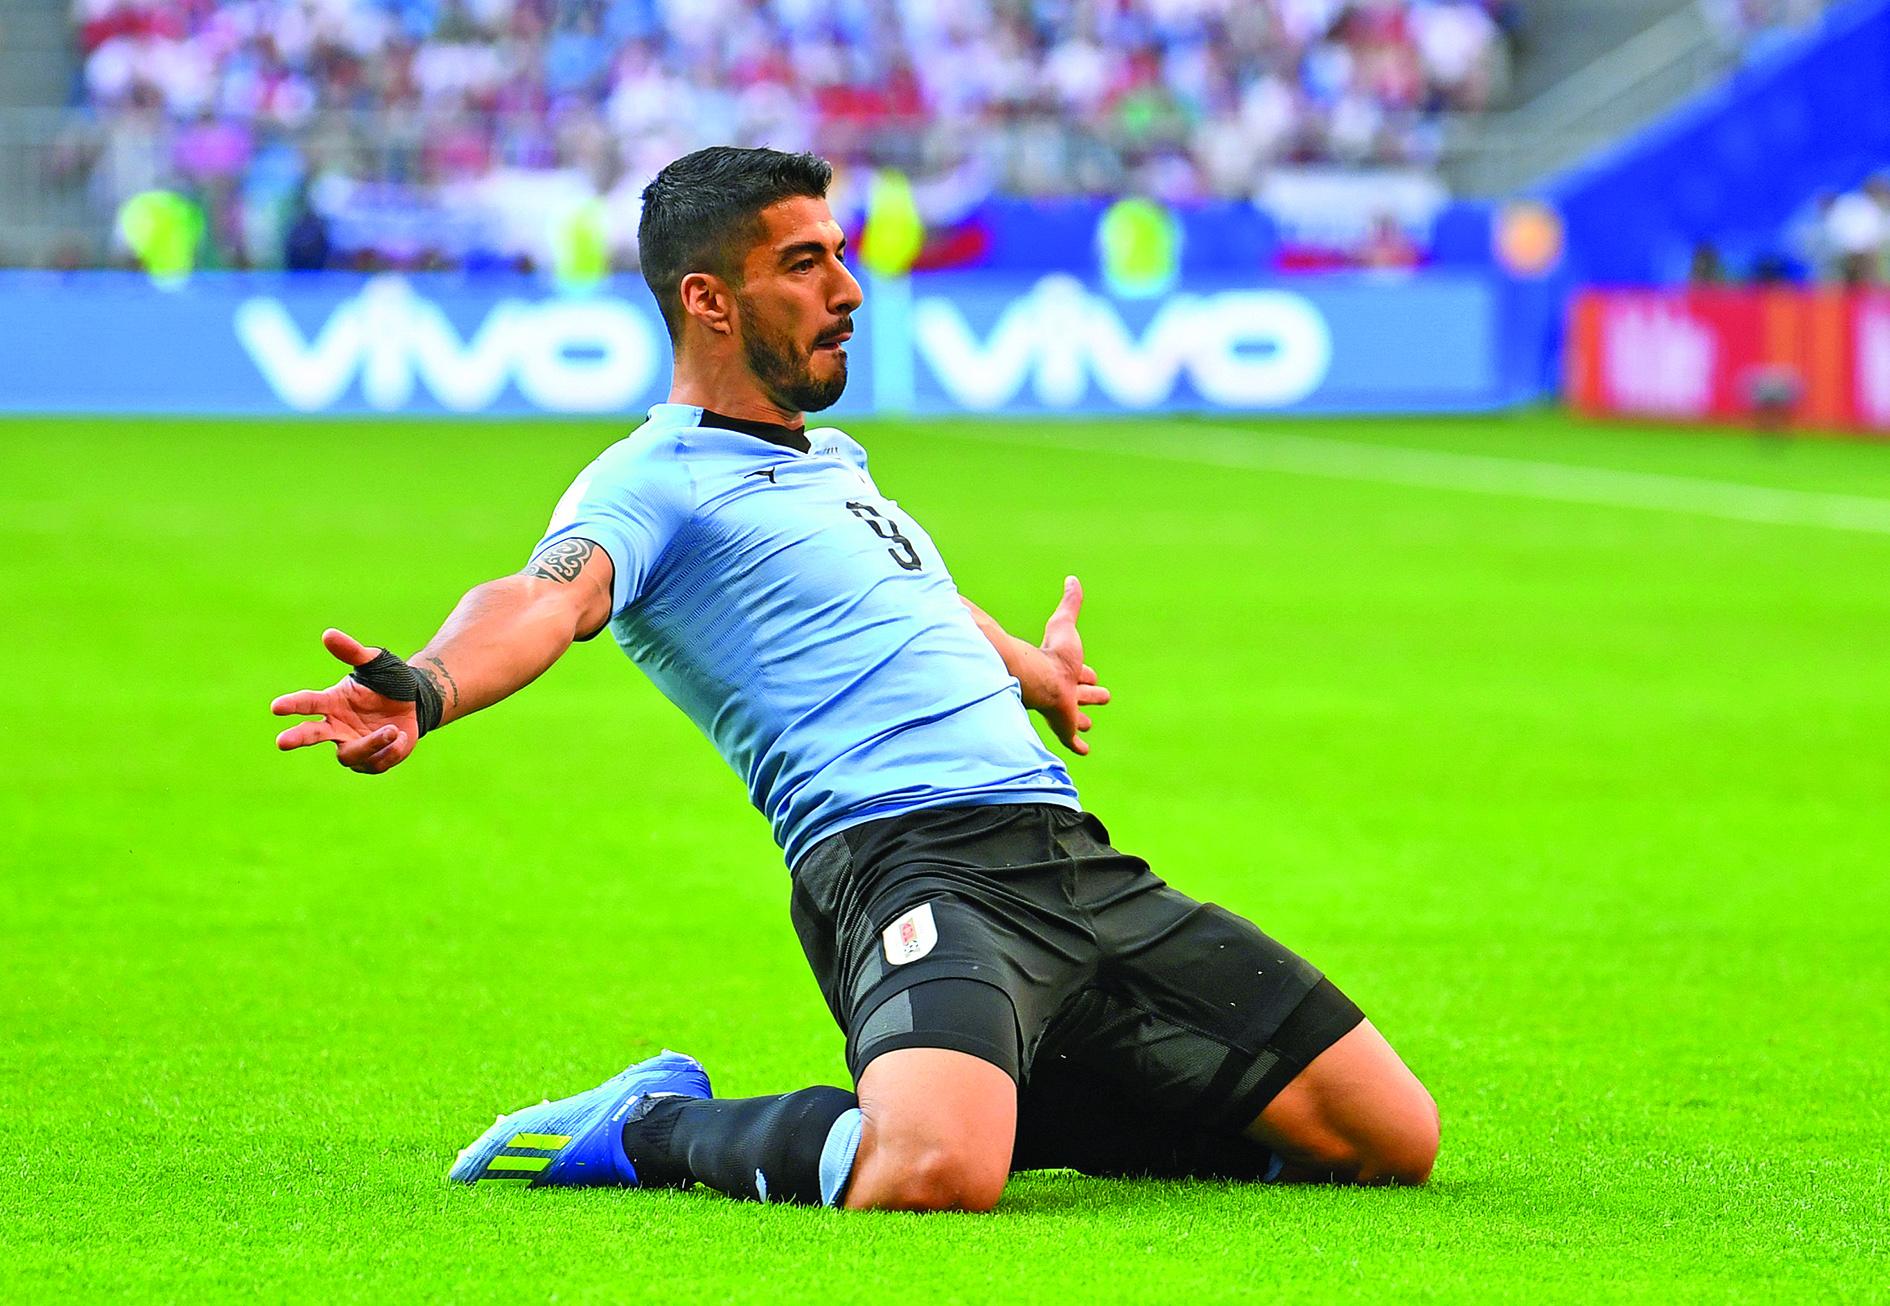 Football: Uruguay punish sluggish Russia to top Group A